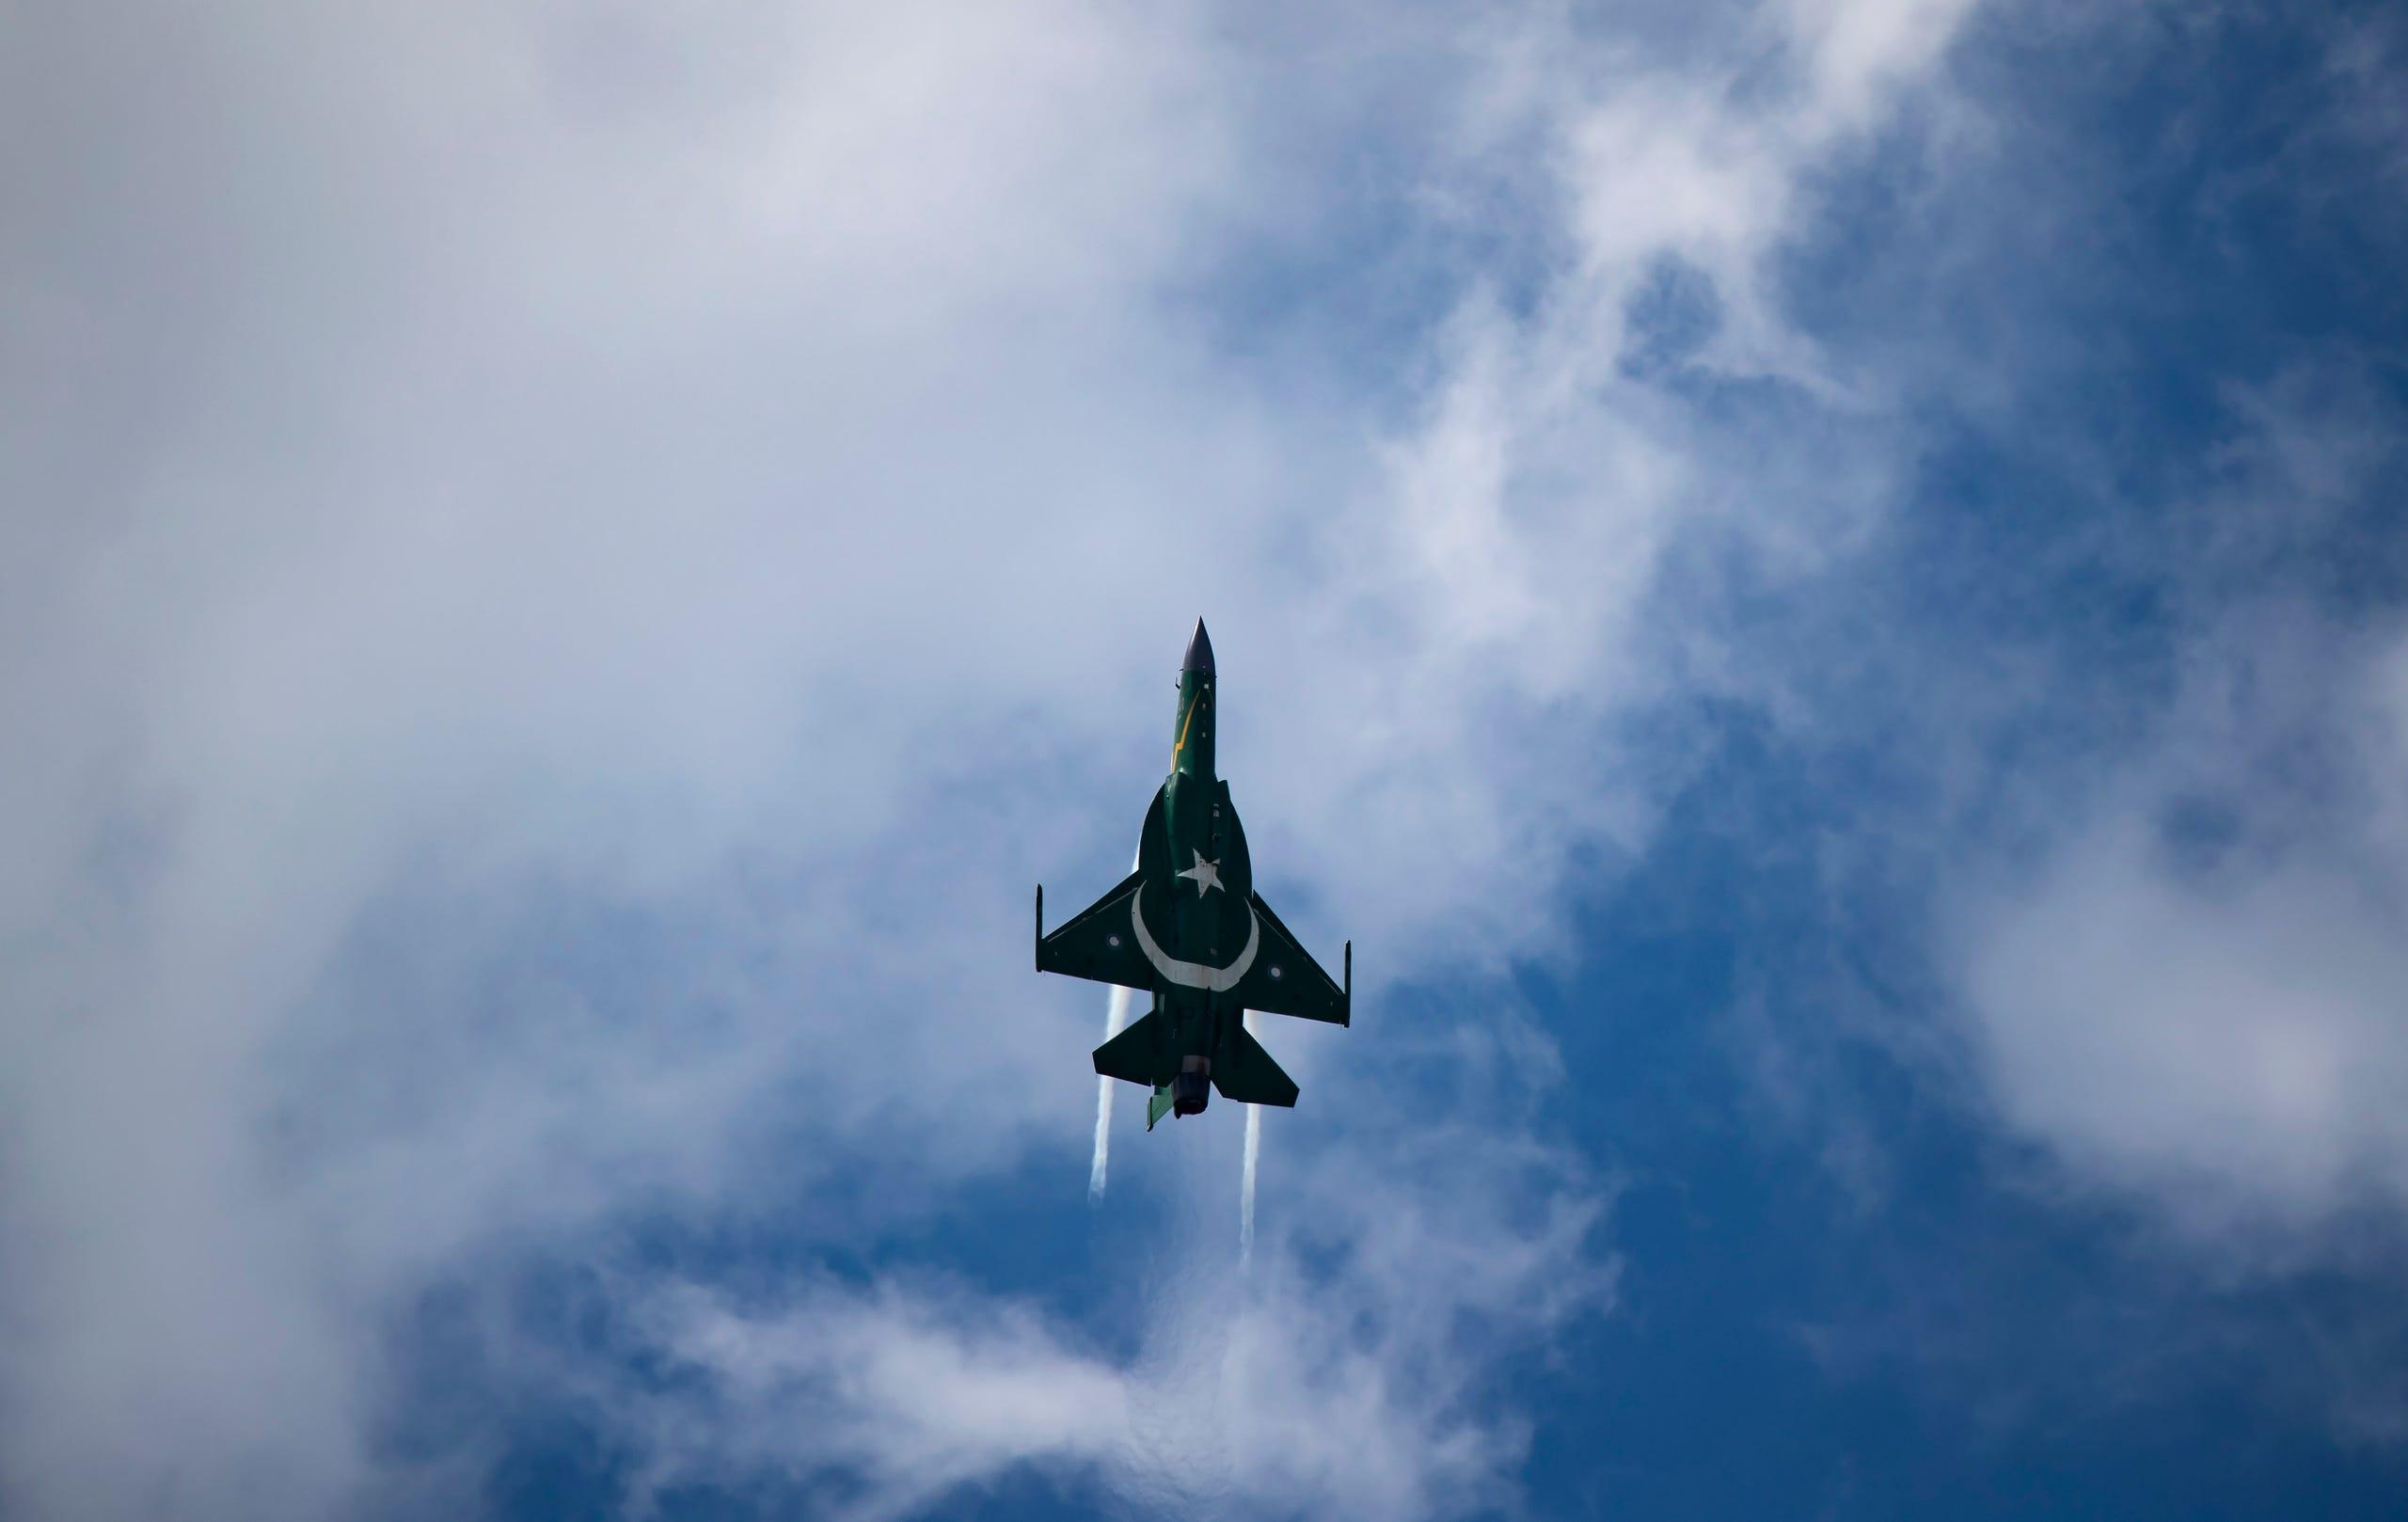 A PAC Kamra JF-17 Thunder fighter jet, June 17, 2019.